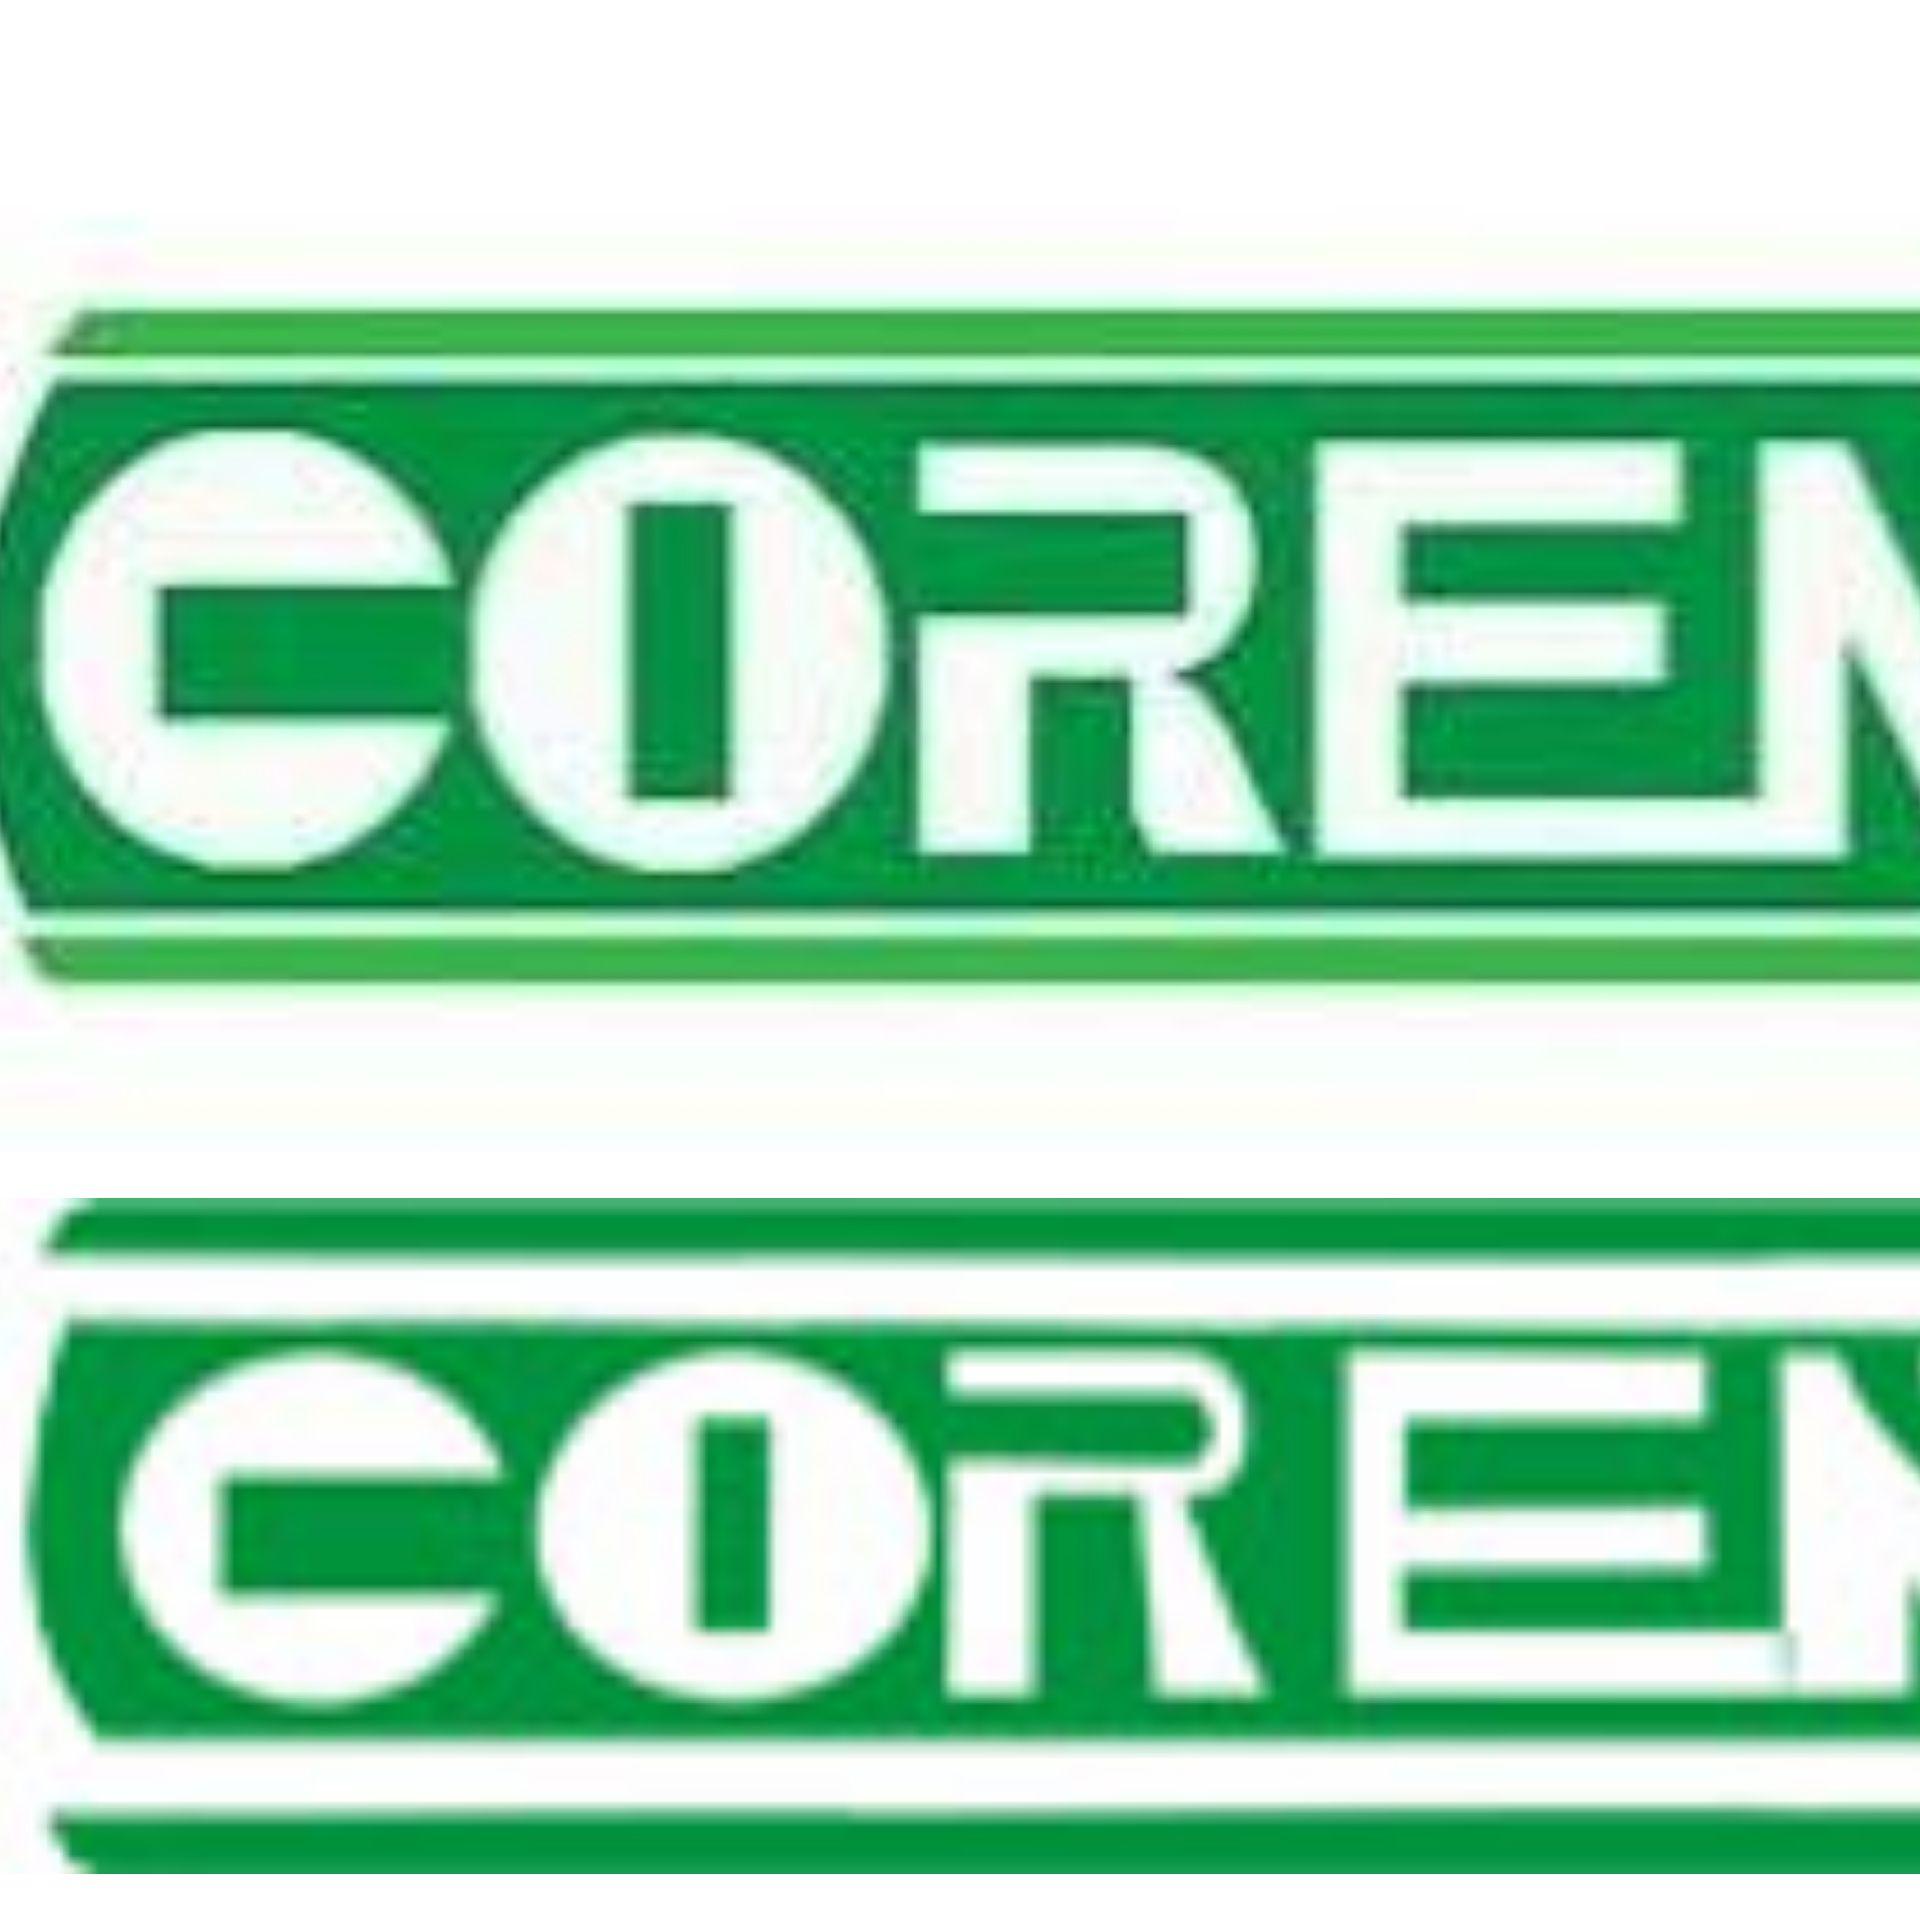 Coren Recruitment Application Form 2020 Apply Here Now Application Form How To Apply Recruitment